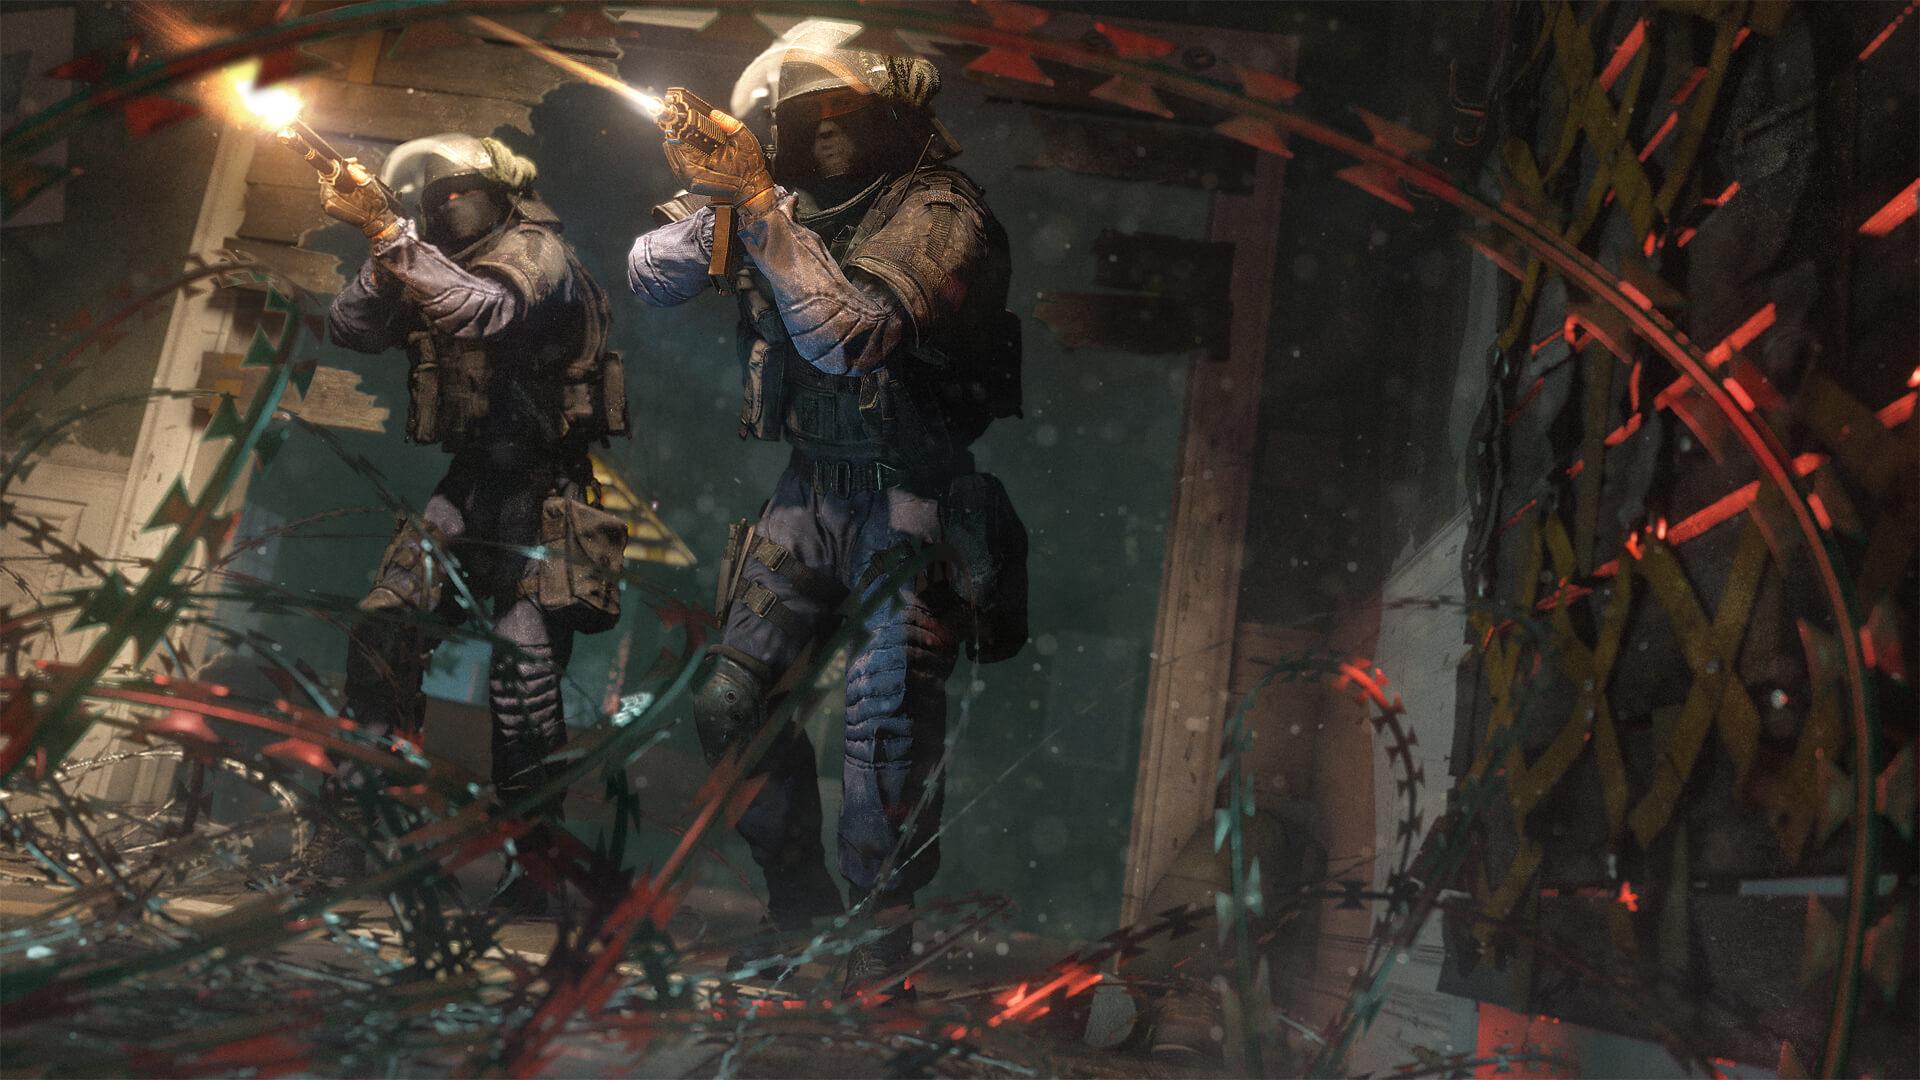 Tom Clancy's Rainbow Six Siege for PS4, XB1, PC Reviews